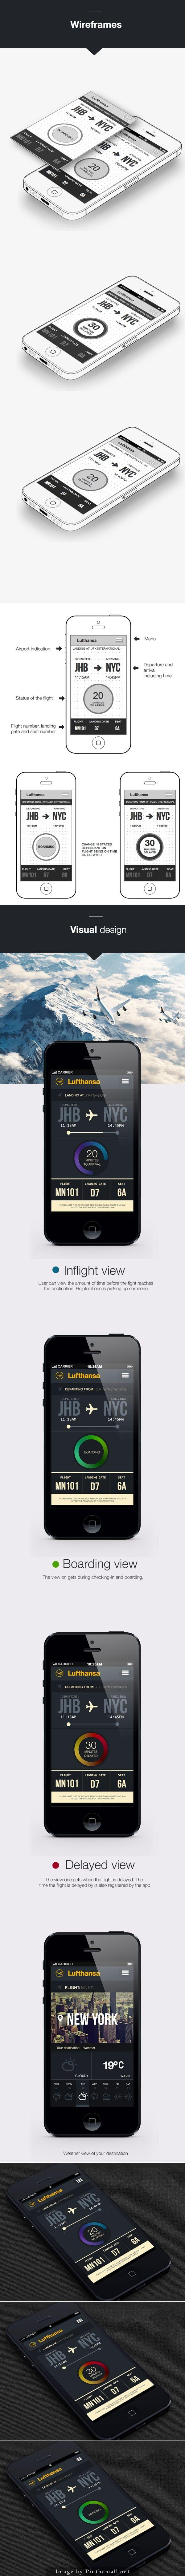 Lufthansa flight tracking app IOS7